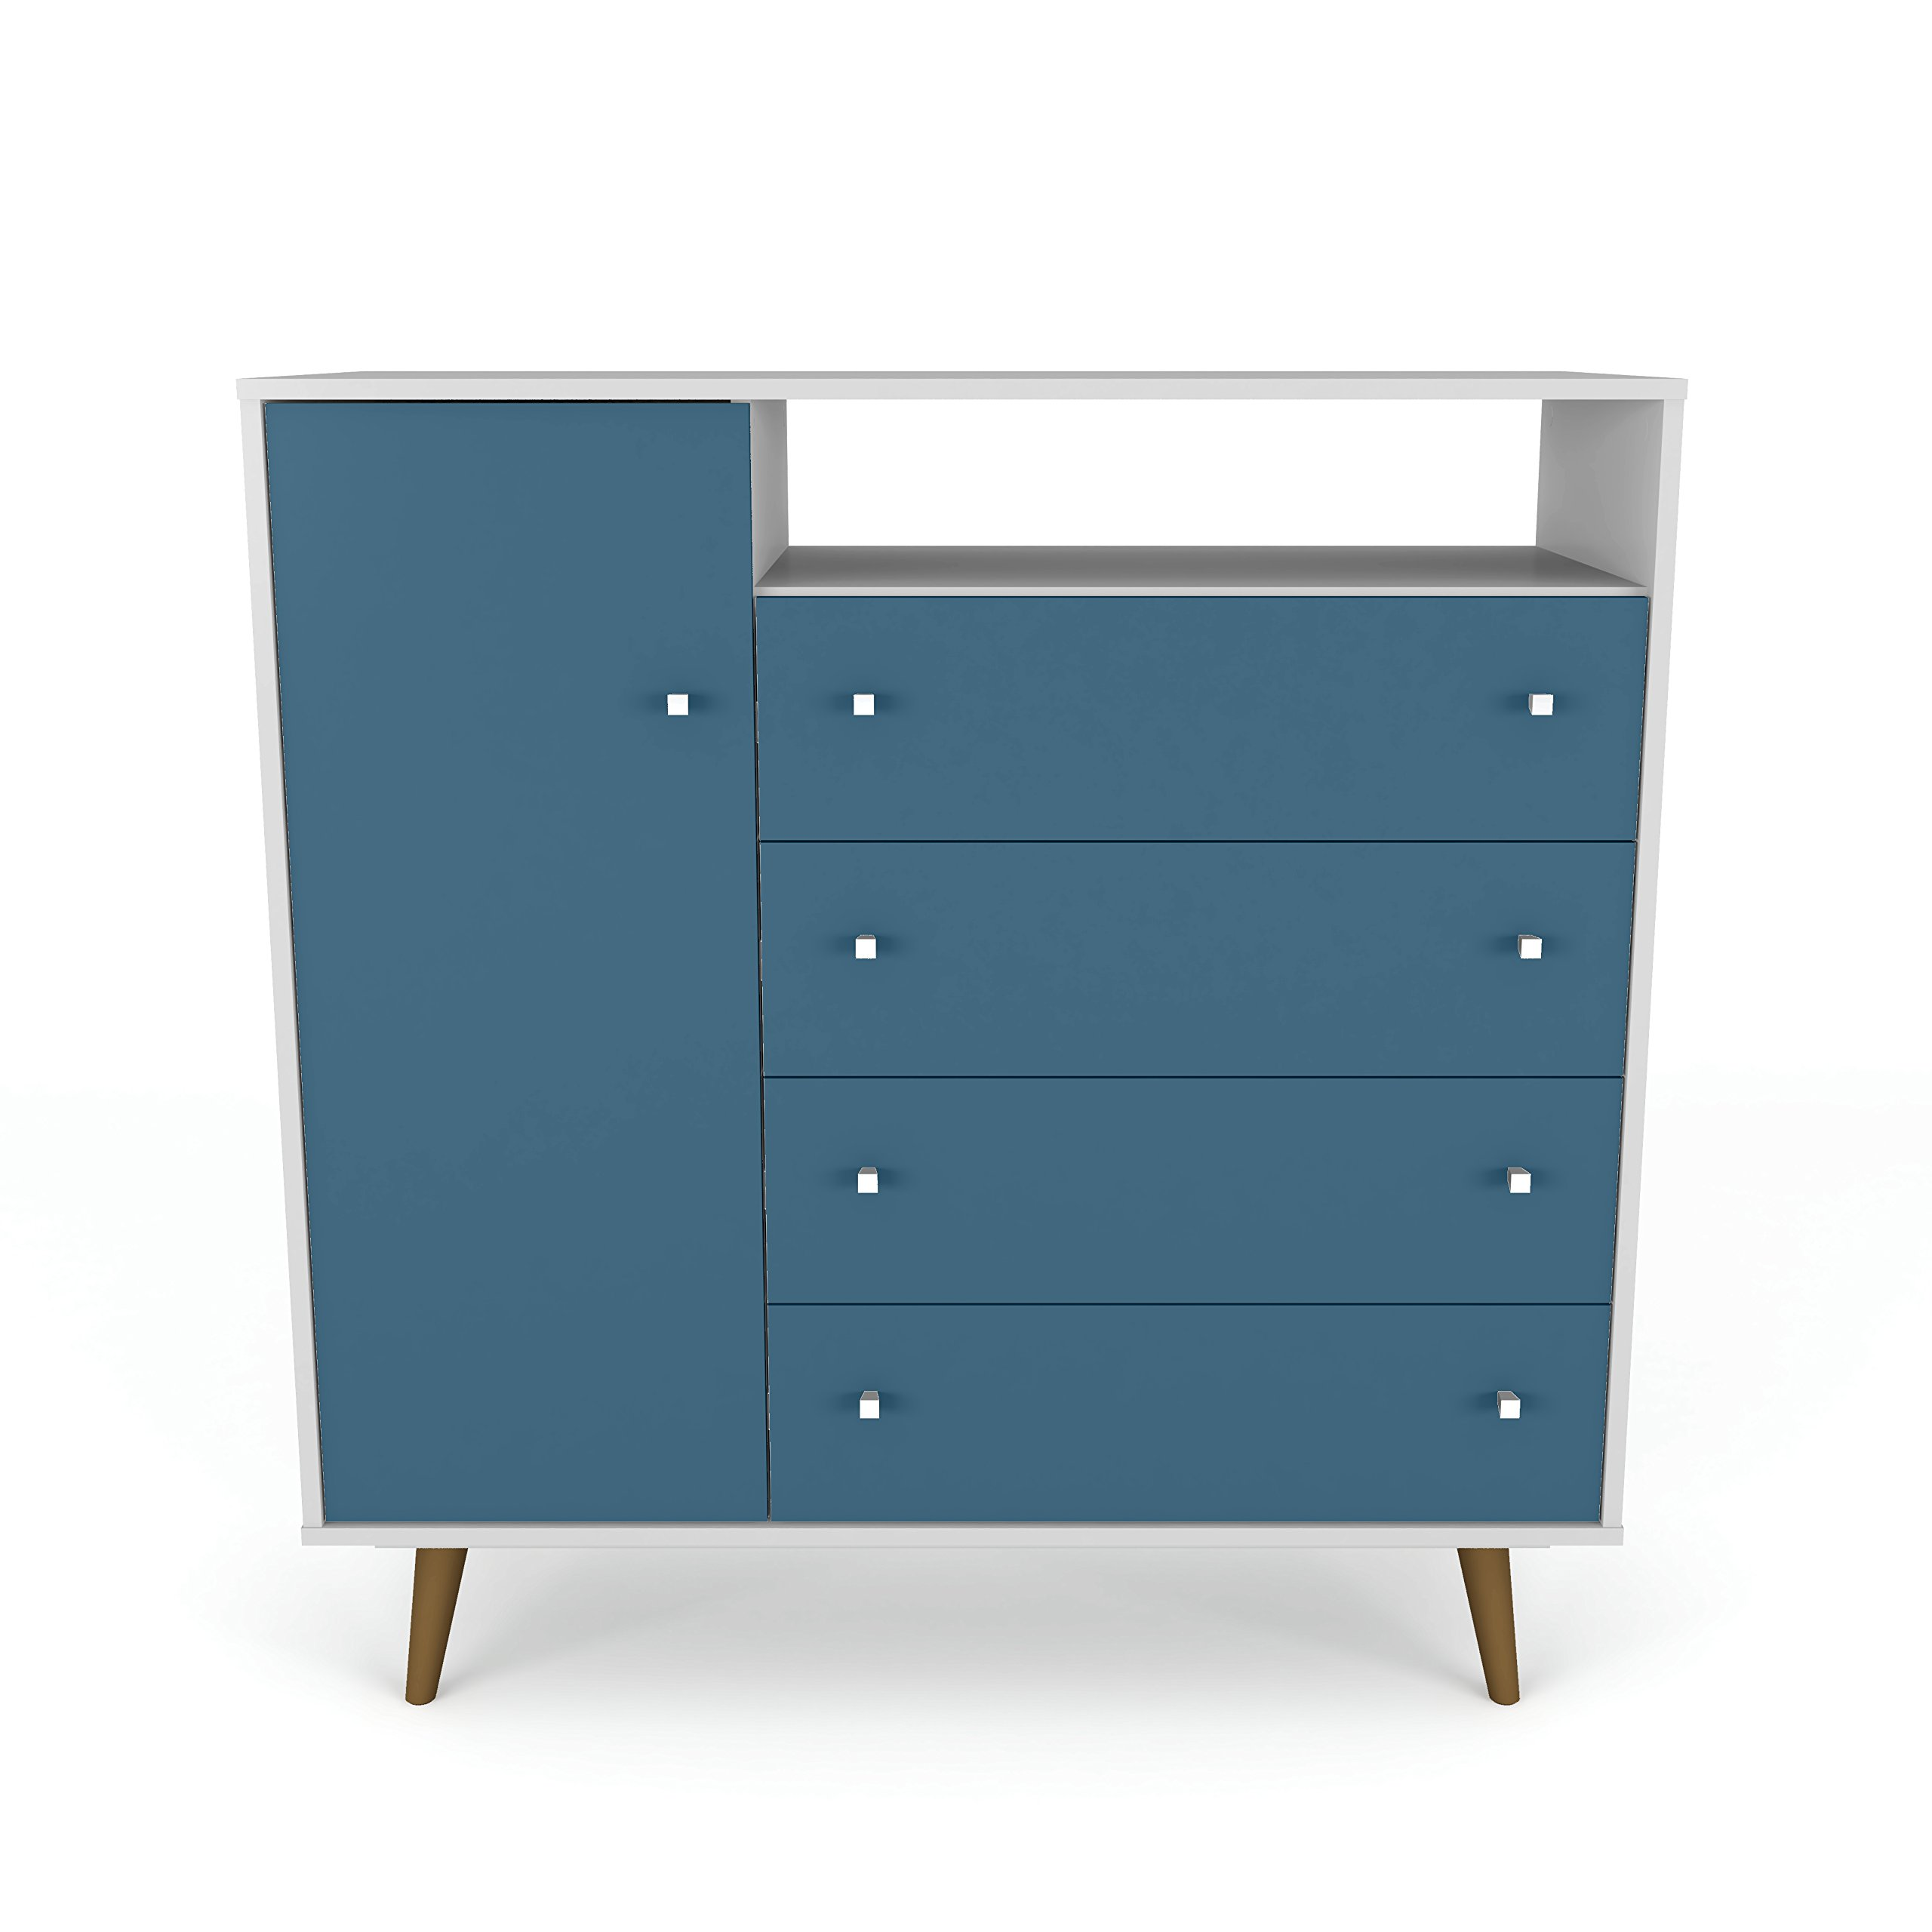 Manhattan Comfort 210BMC63 Liberty Modern Bedroom Armoire and TV Stand, White/Aqua Blue